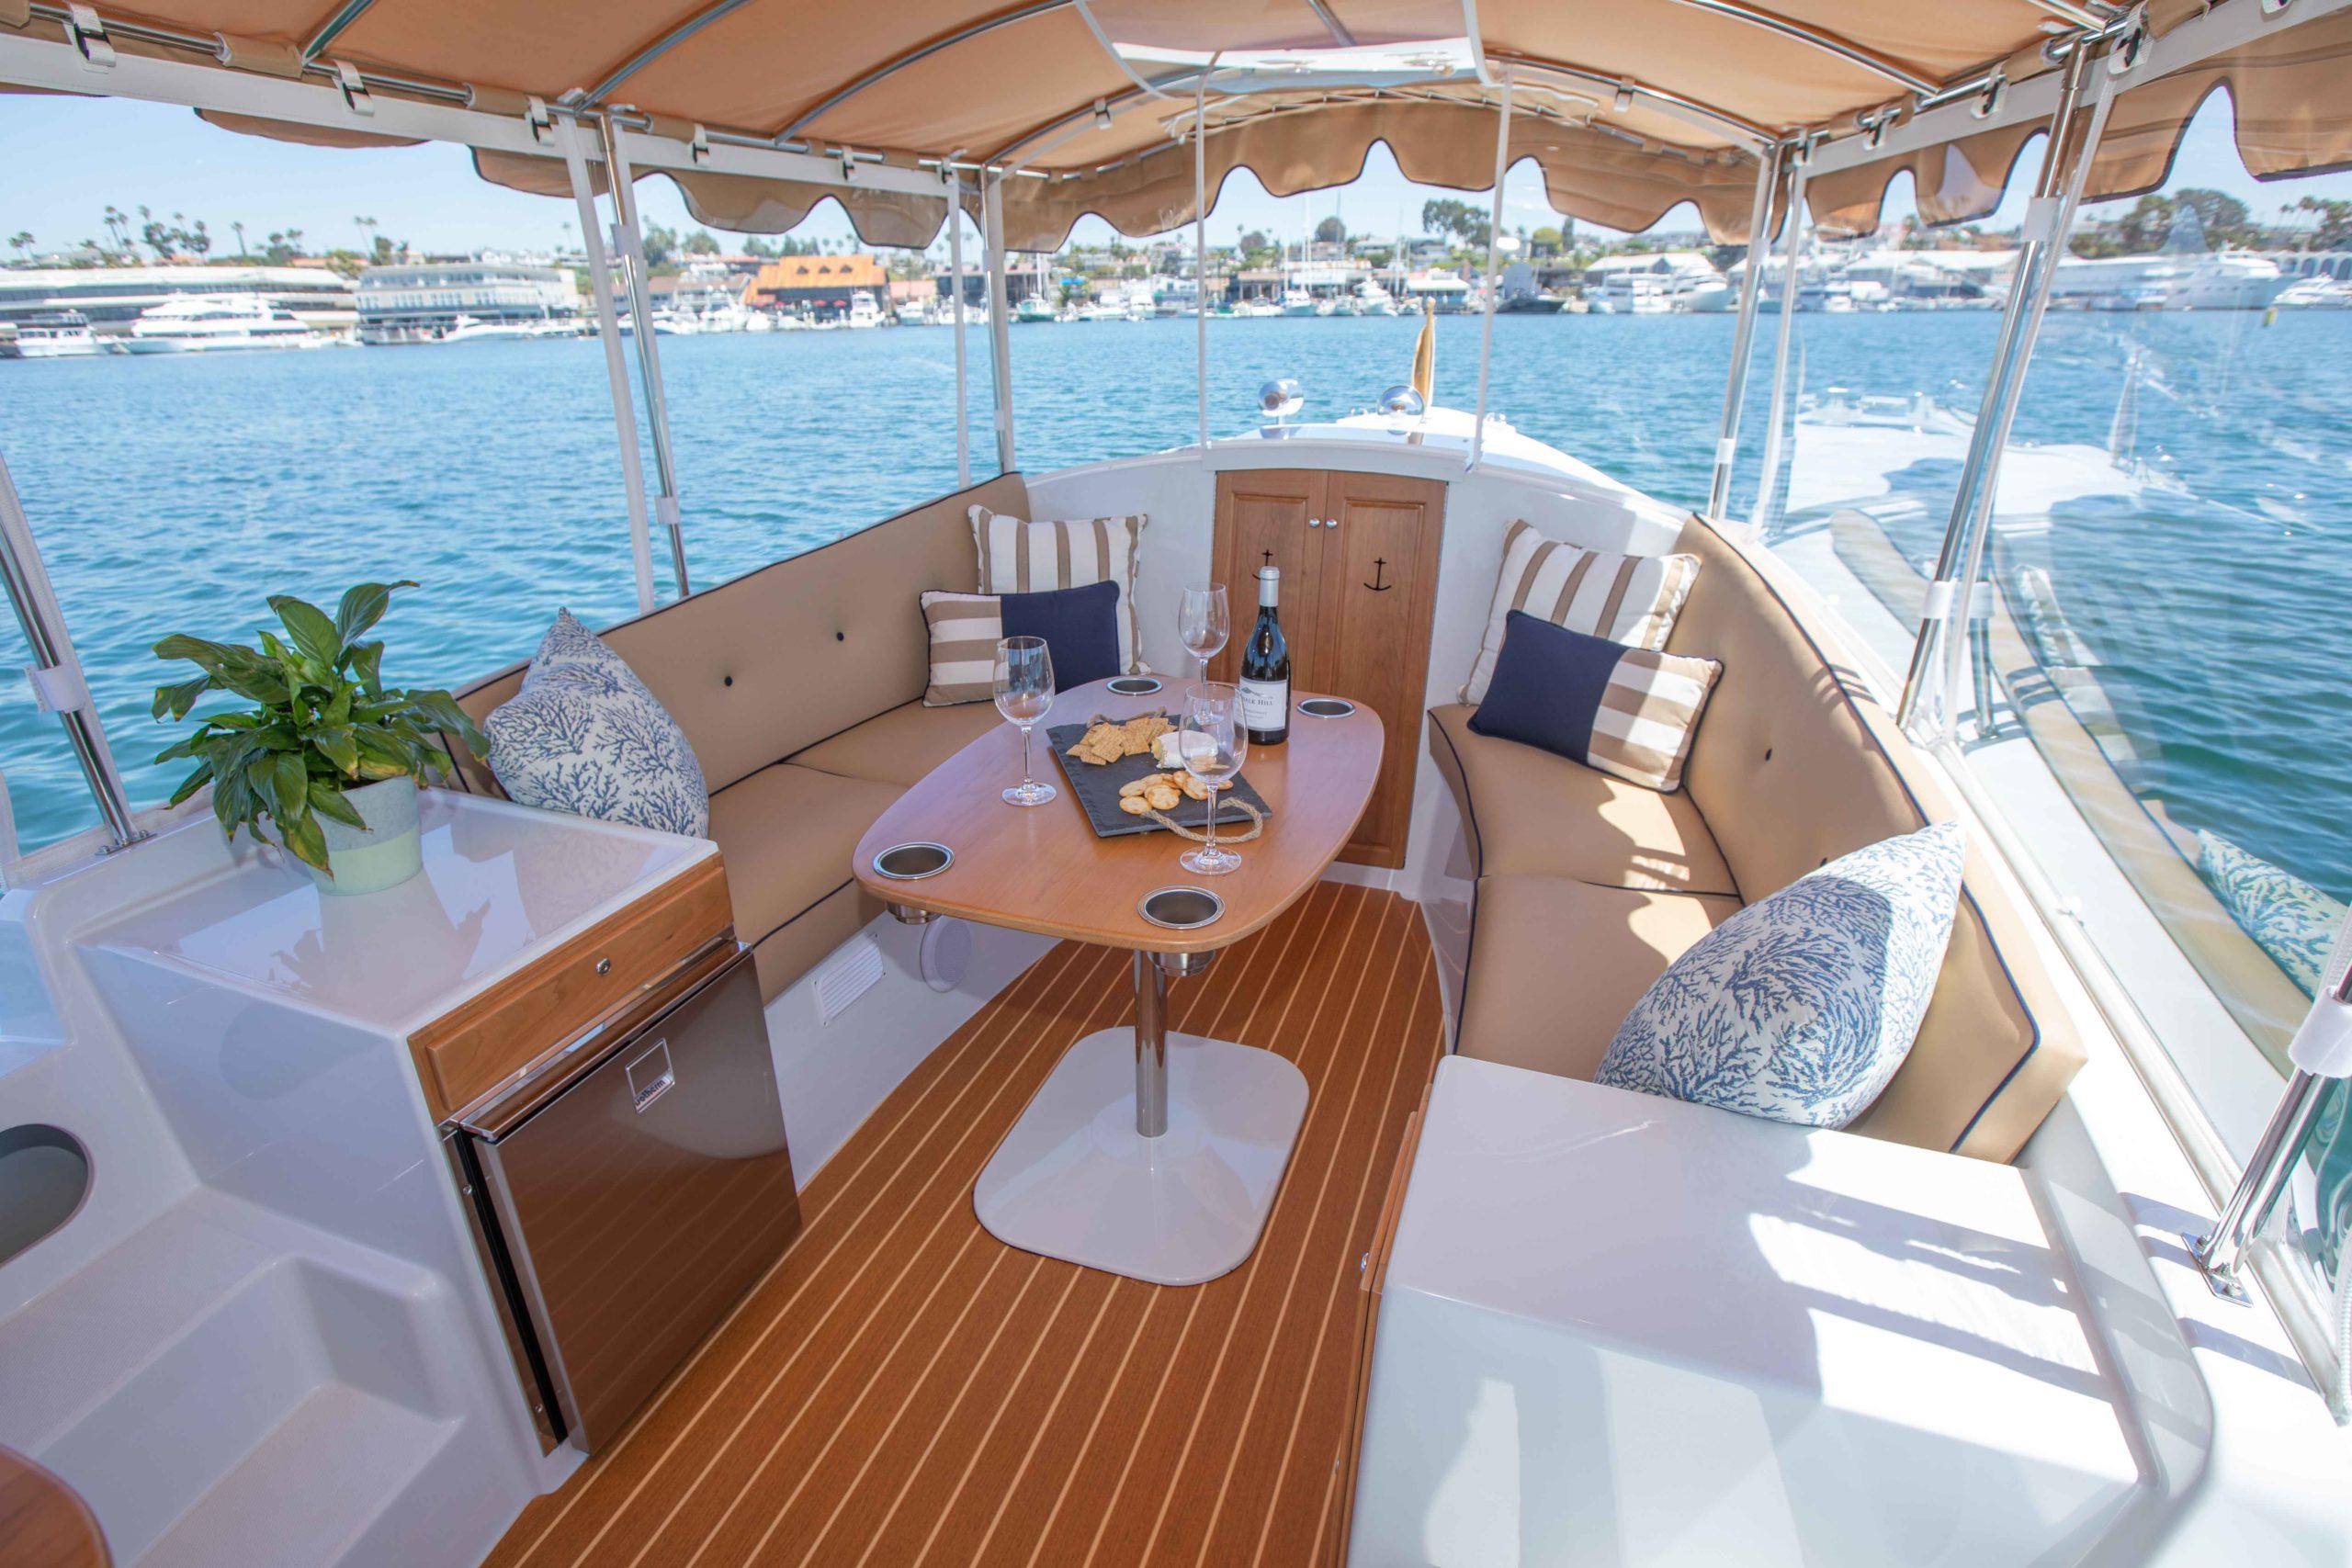 Duffy-Electric-Boats-22-Cuddy-Cabin-Interior-10